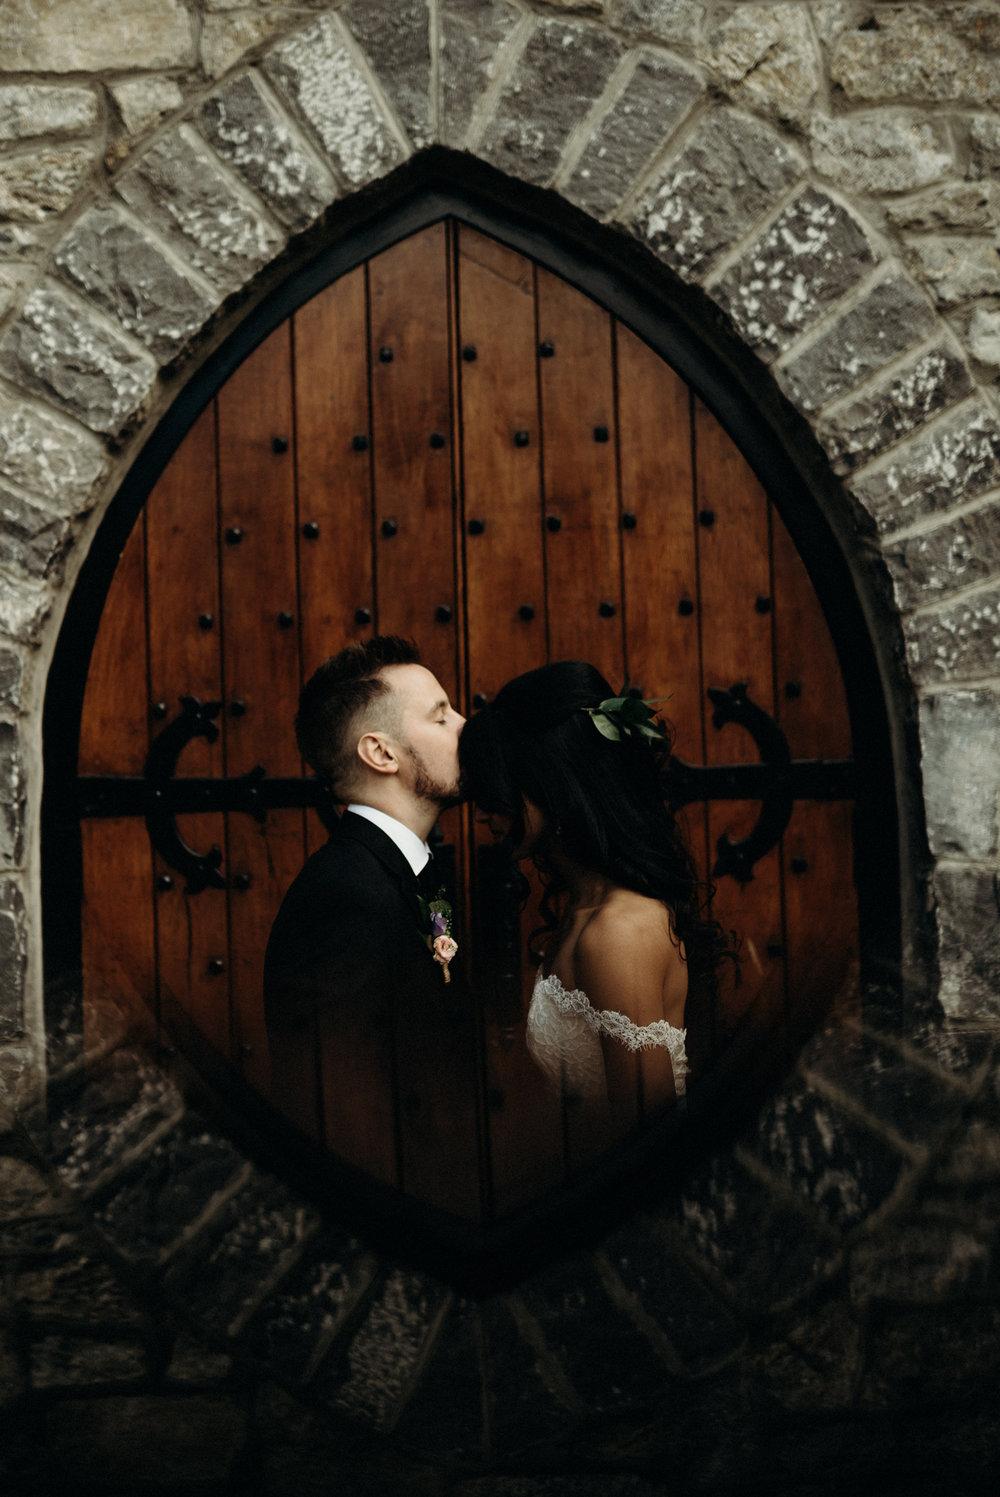 Alan&Naz- Barberstown Castle Wedding - Wedding photographer Ireland-144.jpg